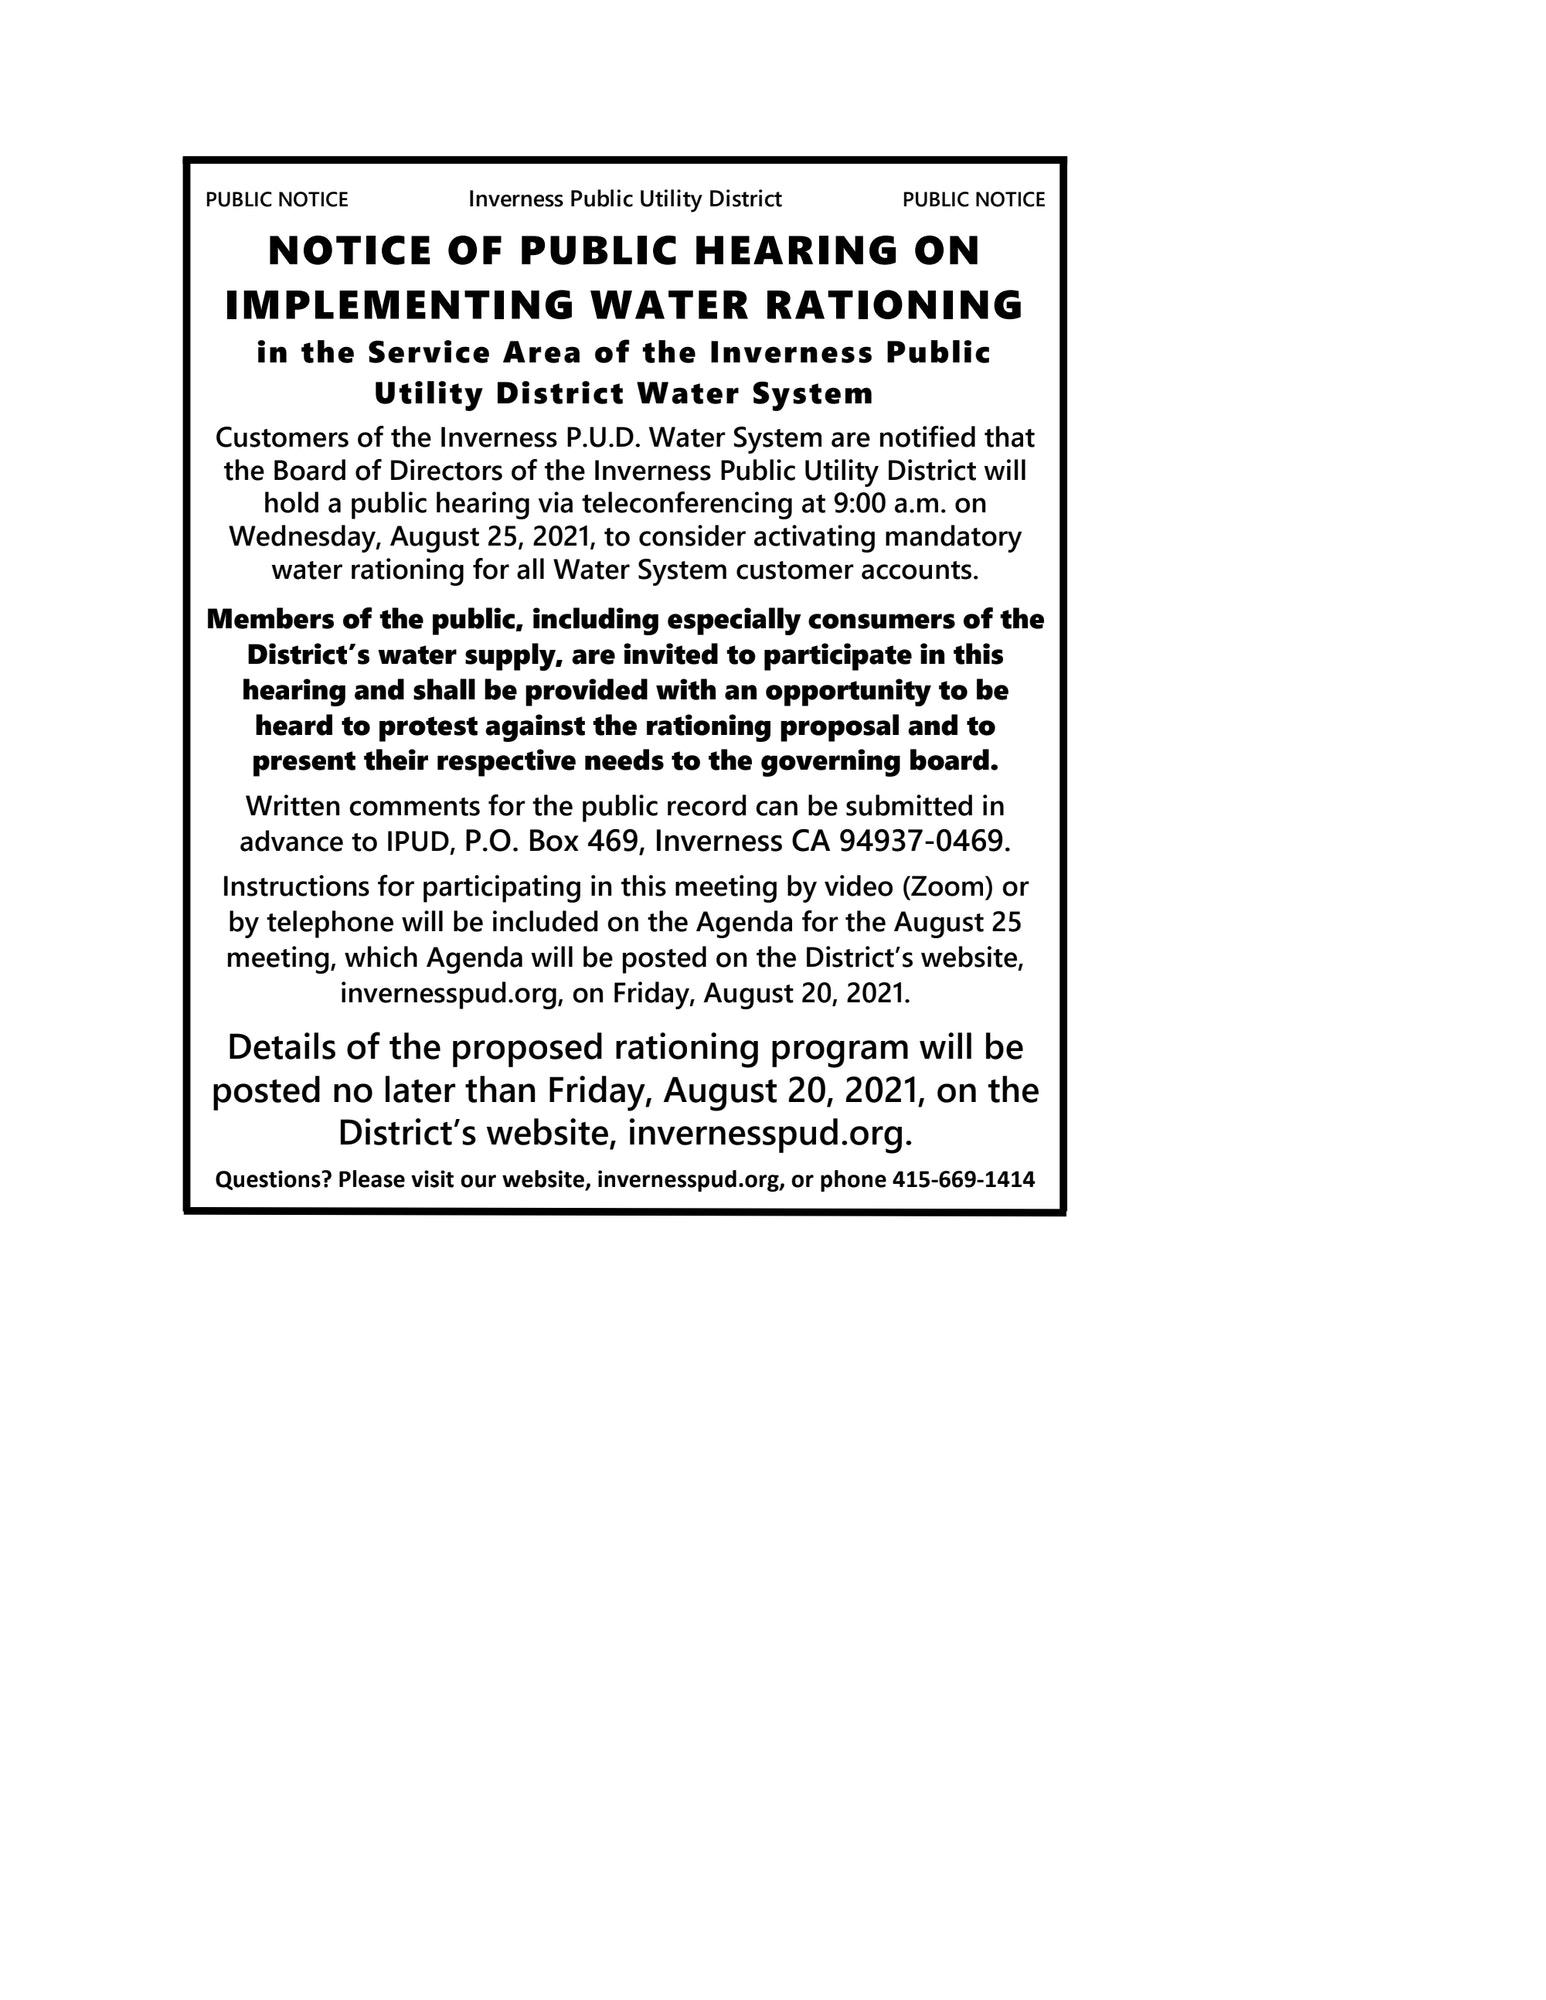 Public Hearing August 25, 2021 Notice